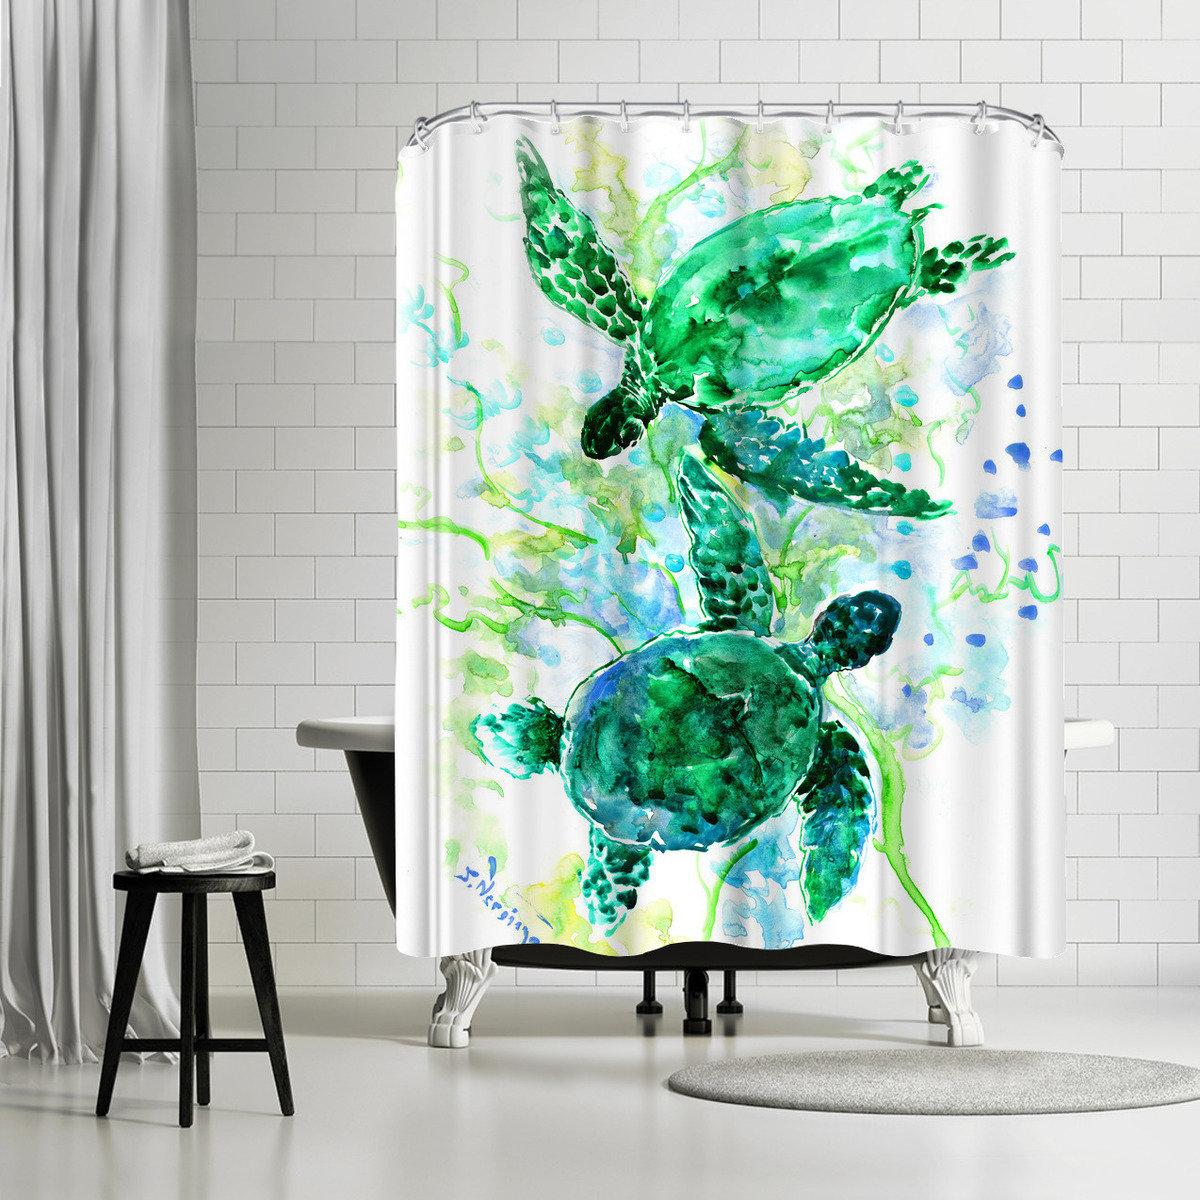 East Urban Home Suren Nersisyan Sea World Turtles Single Shower Curtain Wayfair